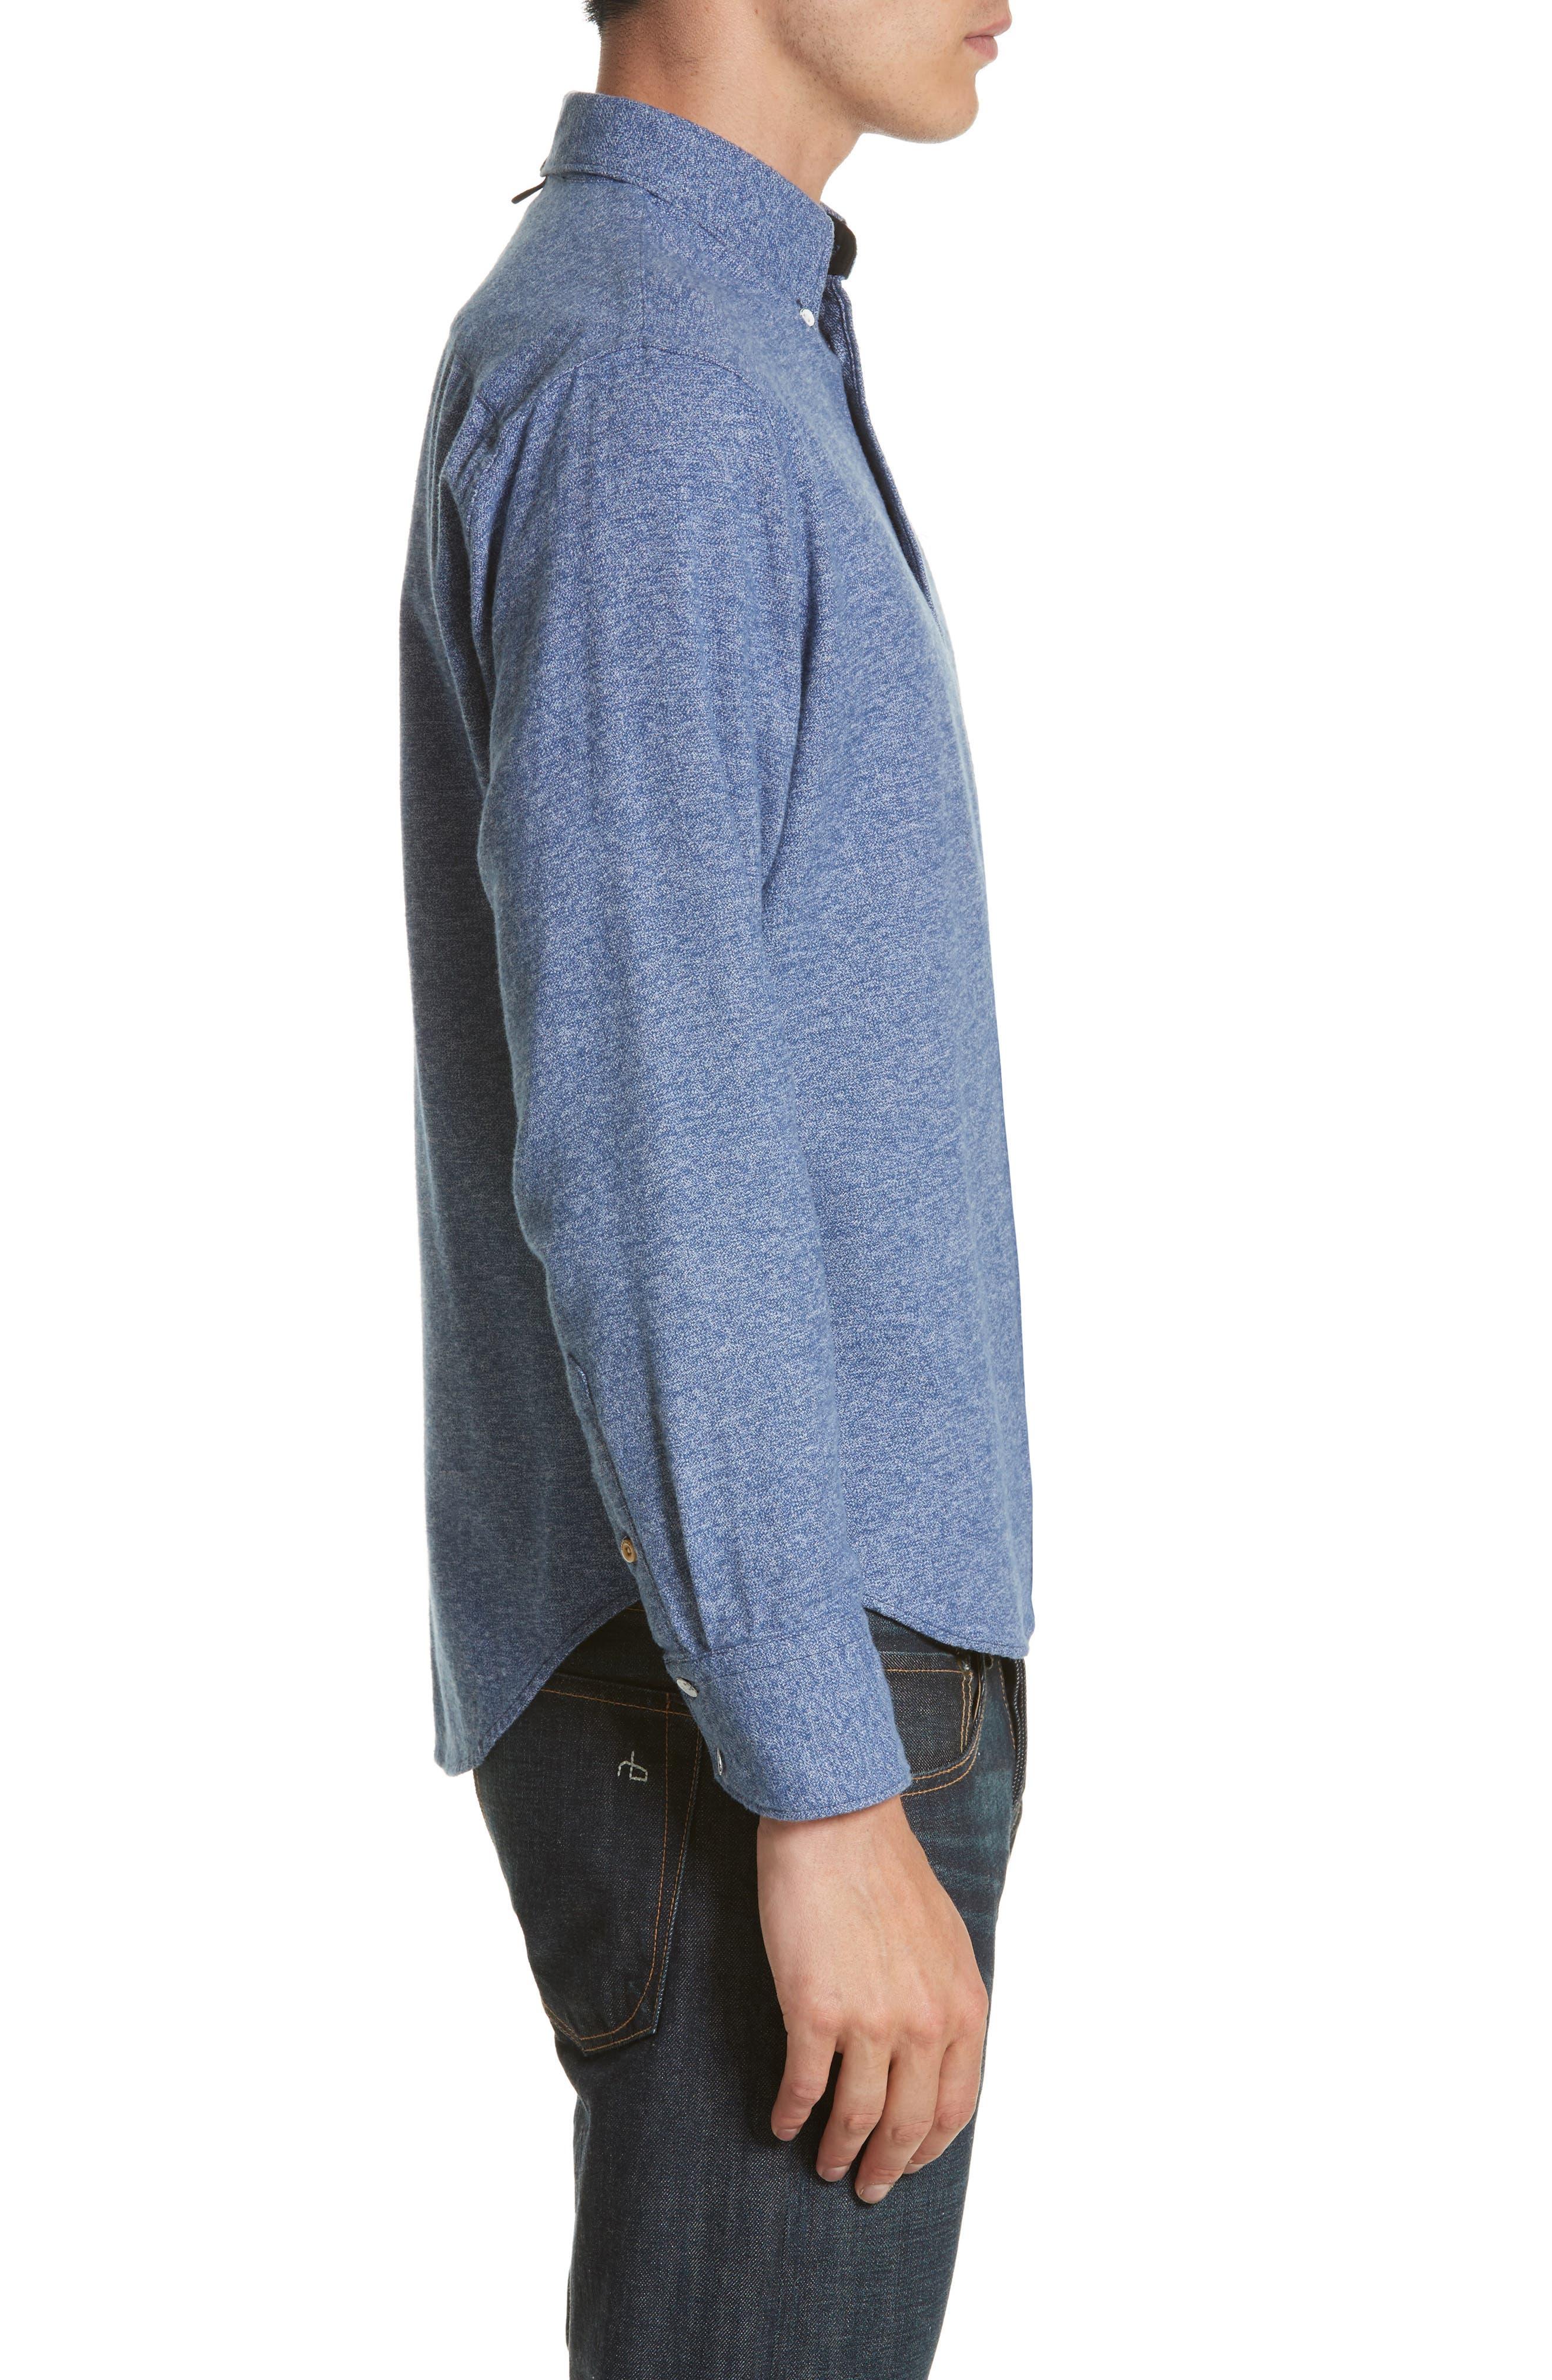 Fit 2 Base Woven Shirt,                             Alternate thumbnail 4, color,                             400